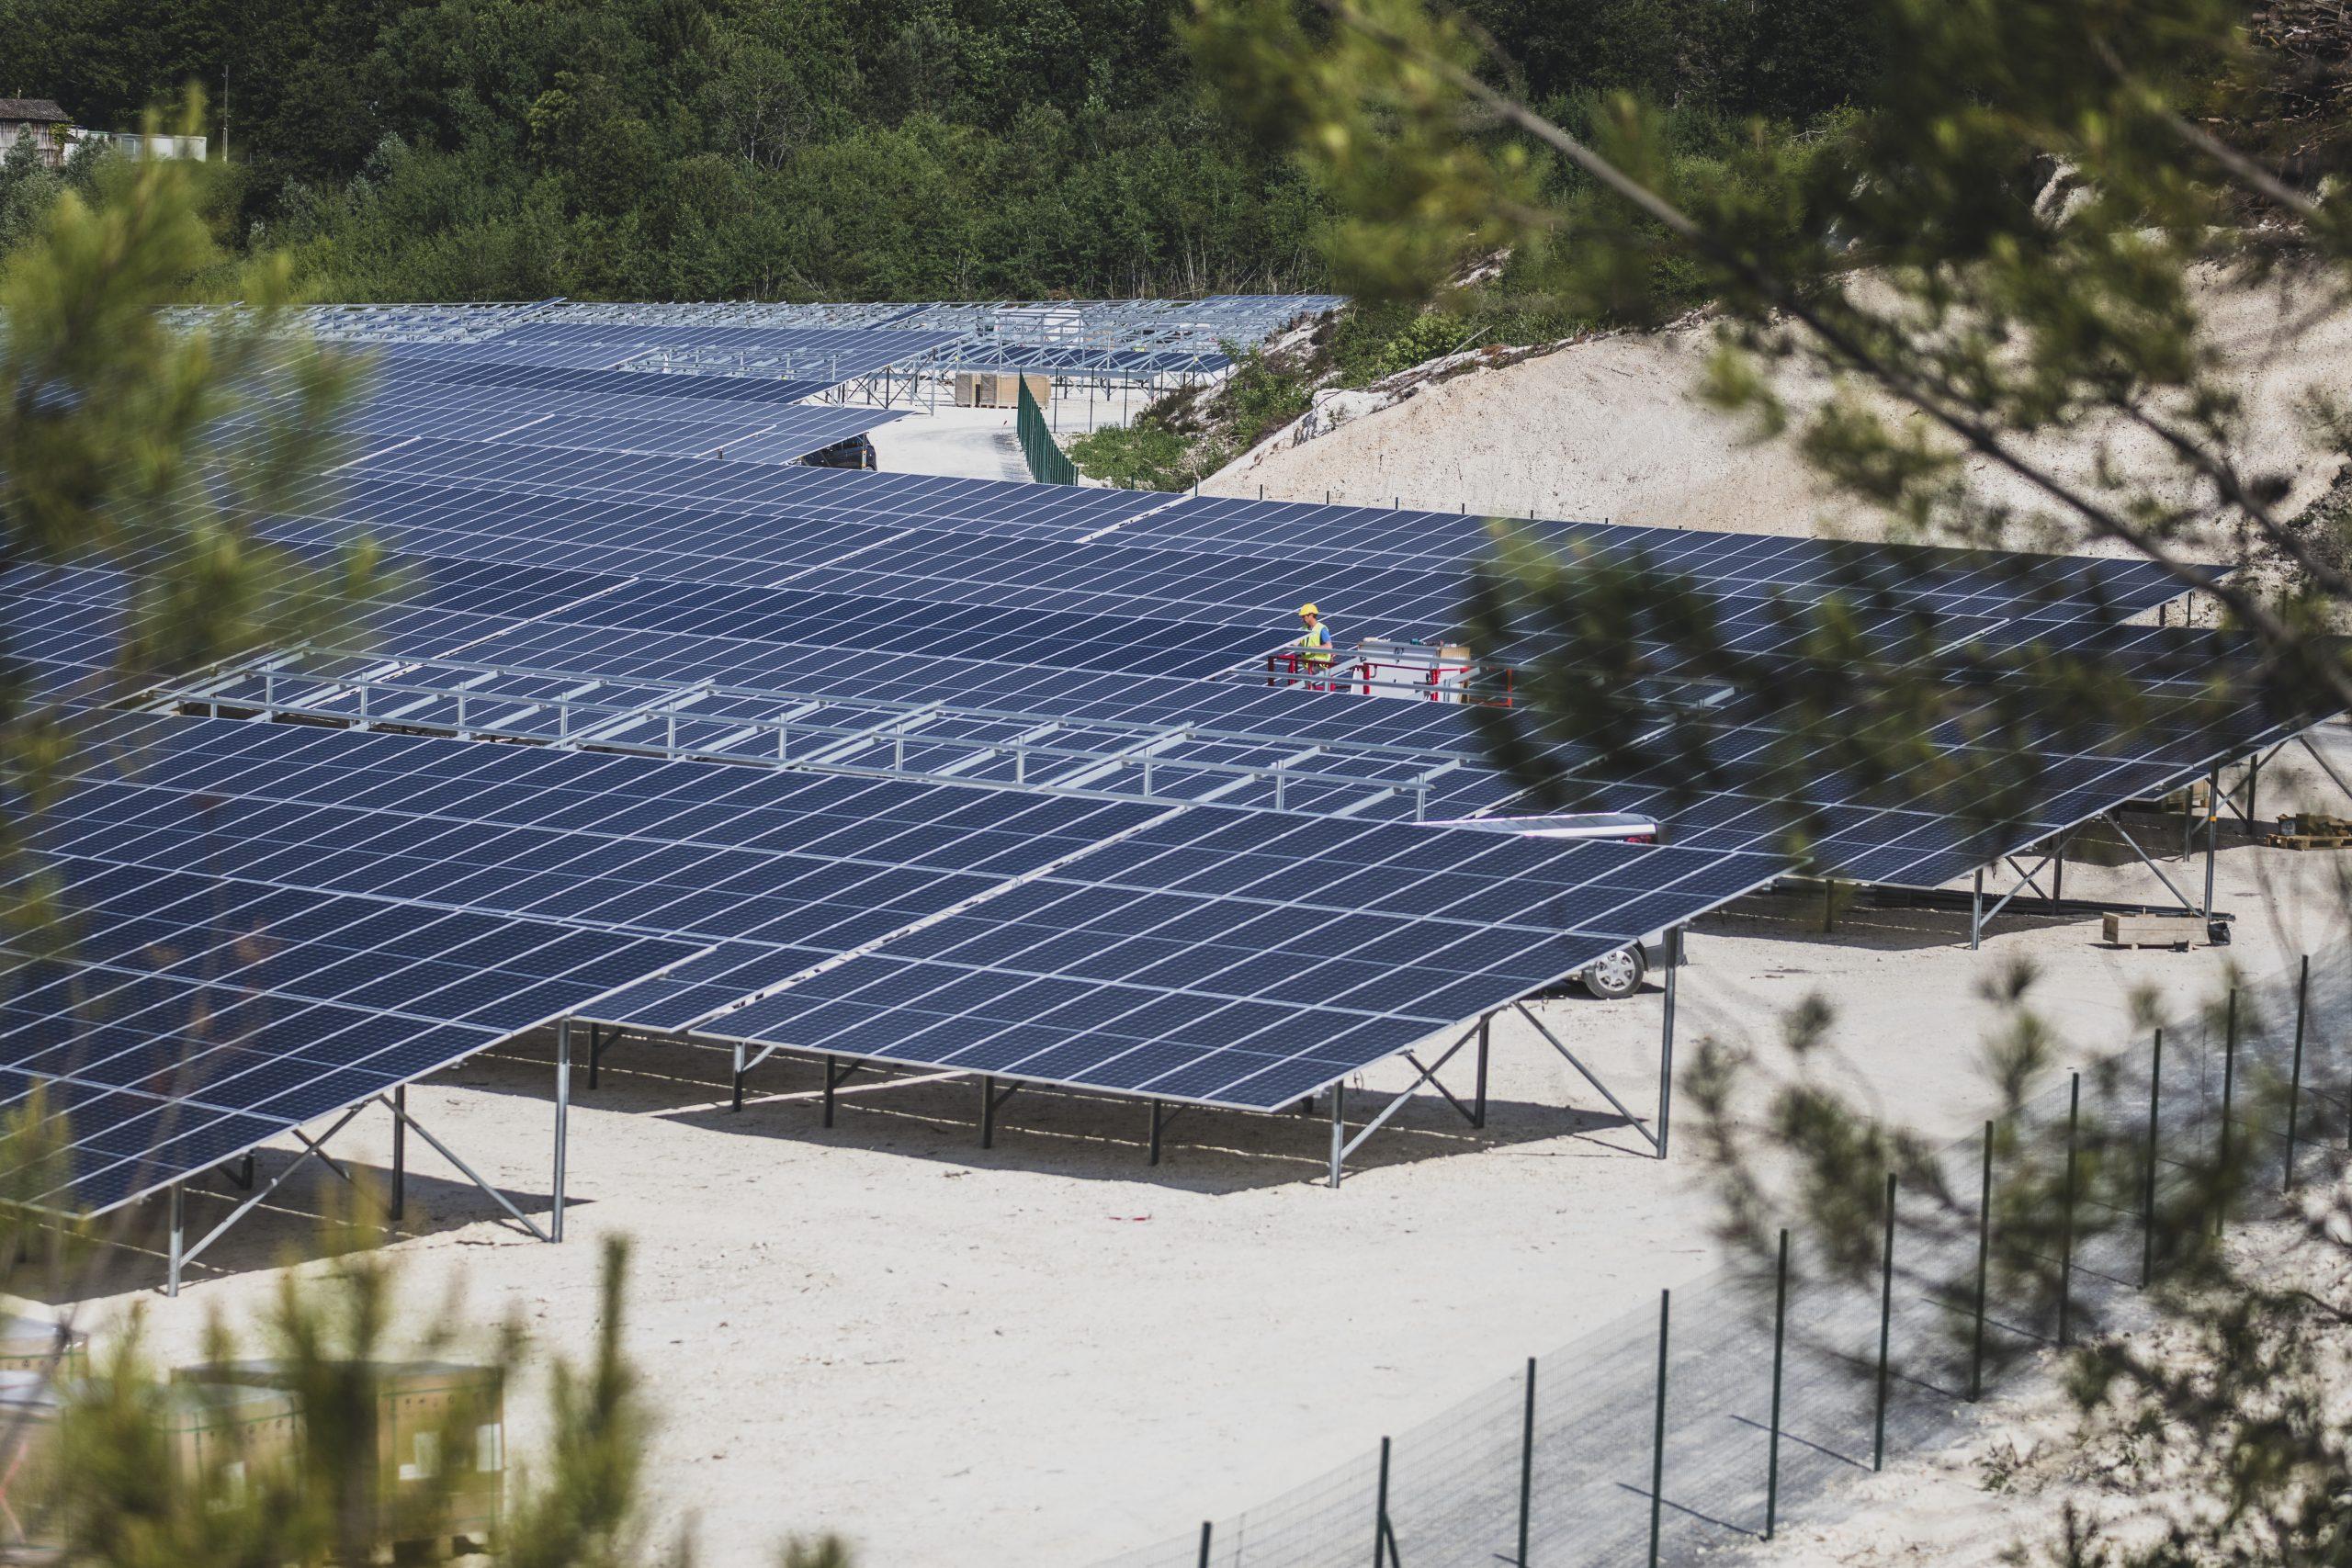 Paulmy-solar-power-plant-degraded-land-quarry-clay